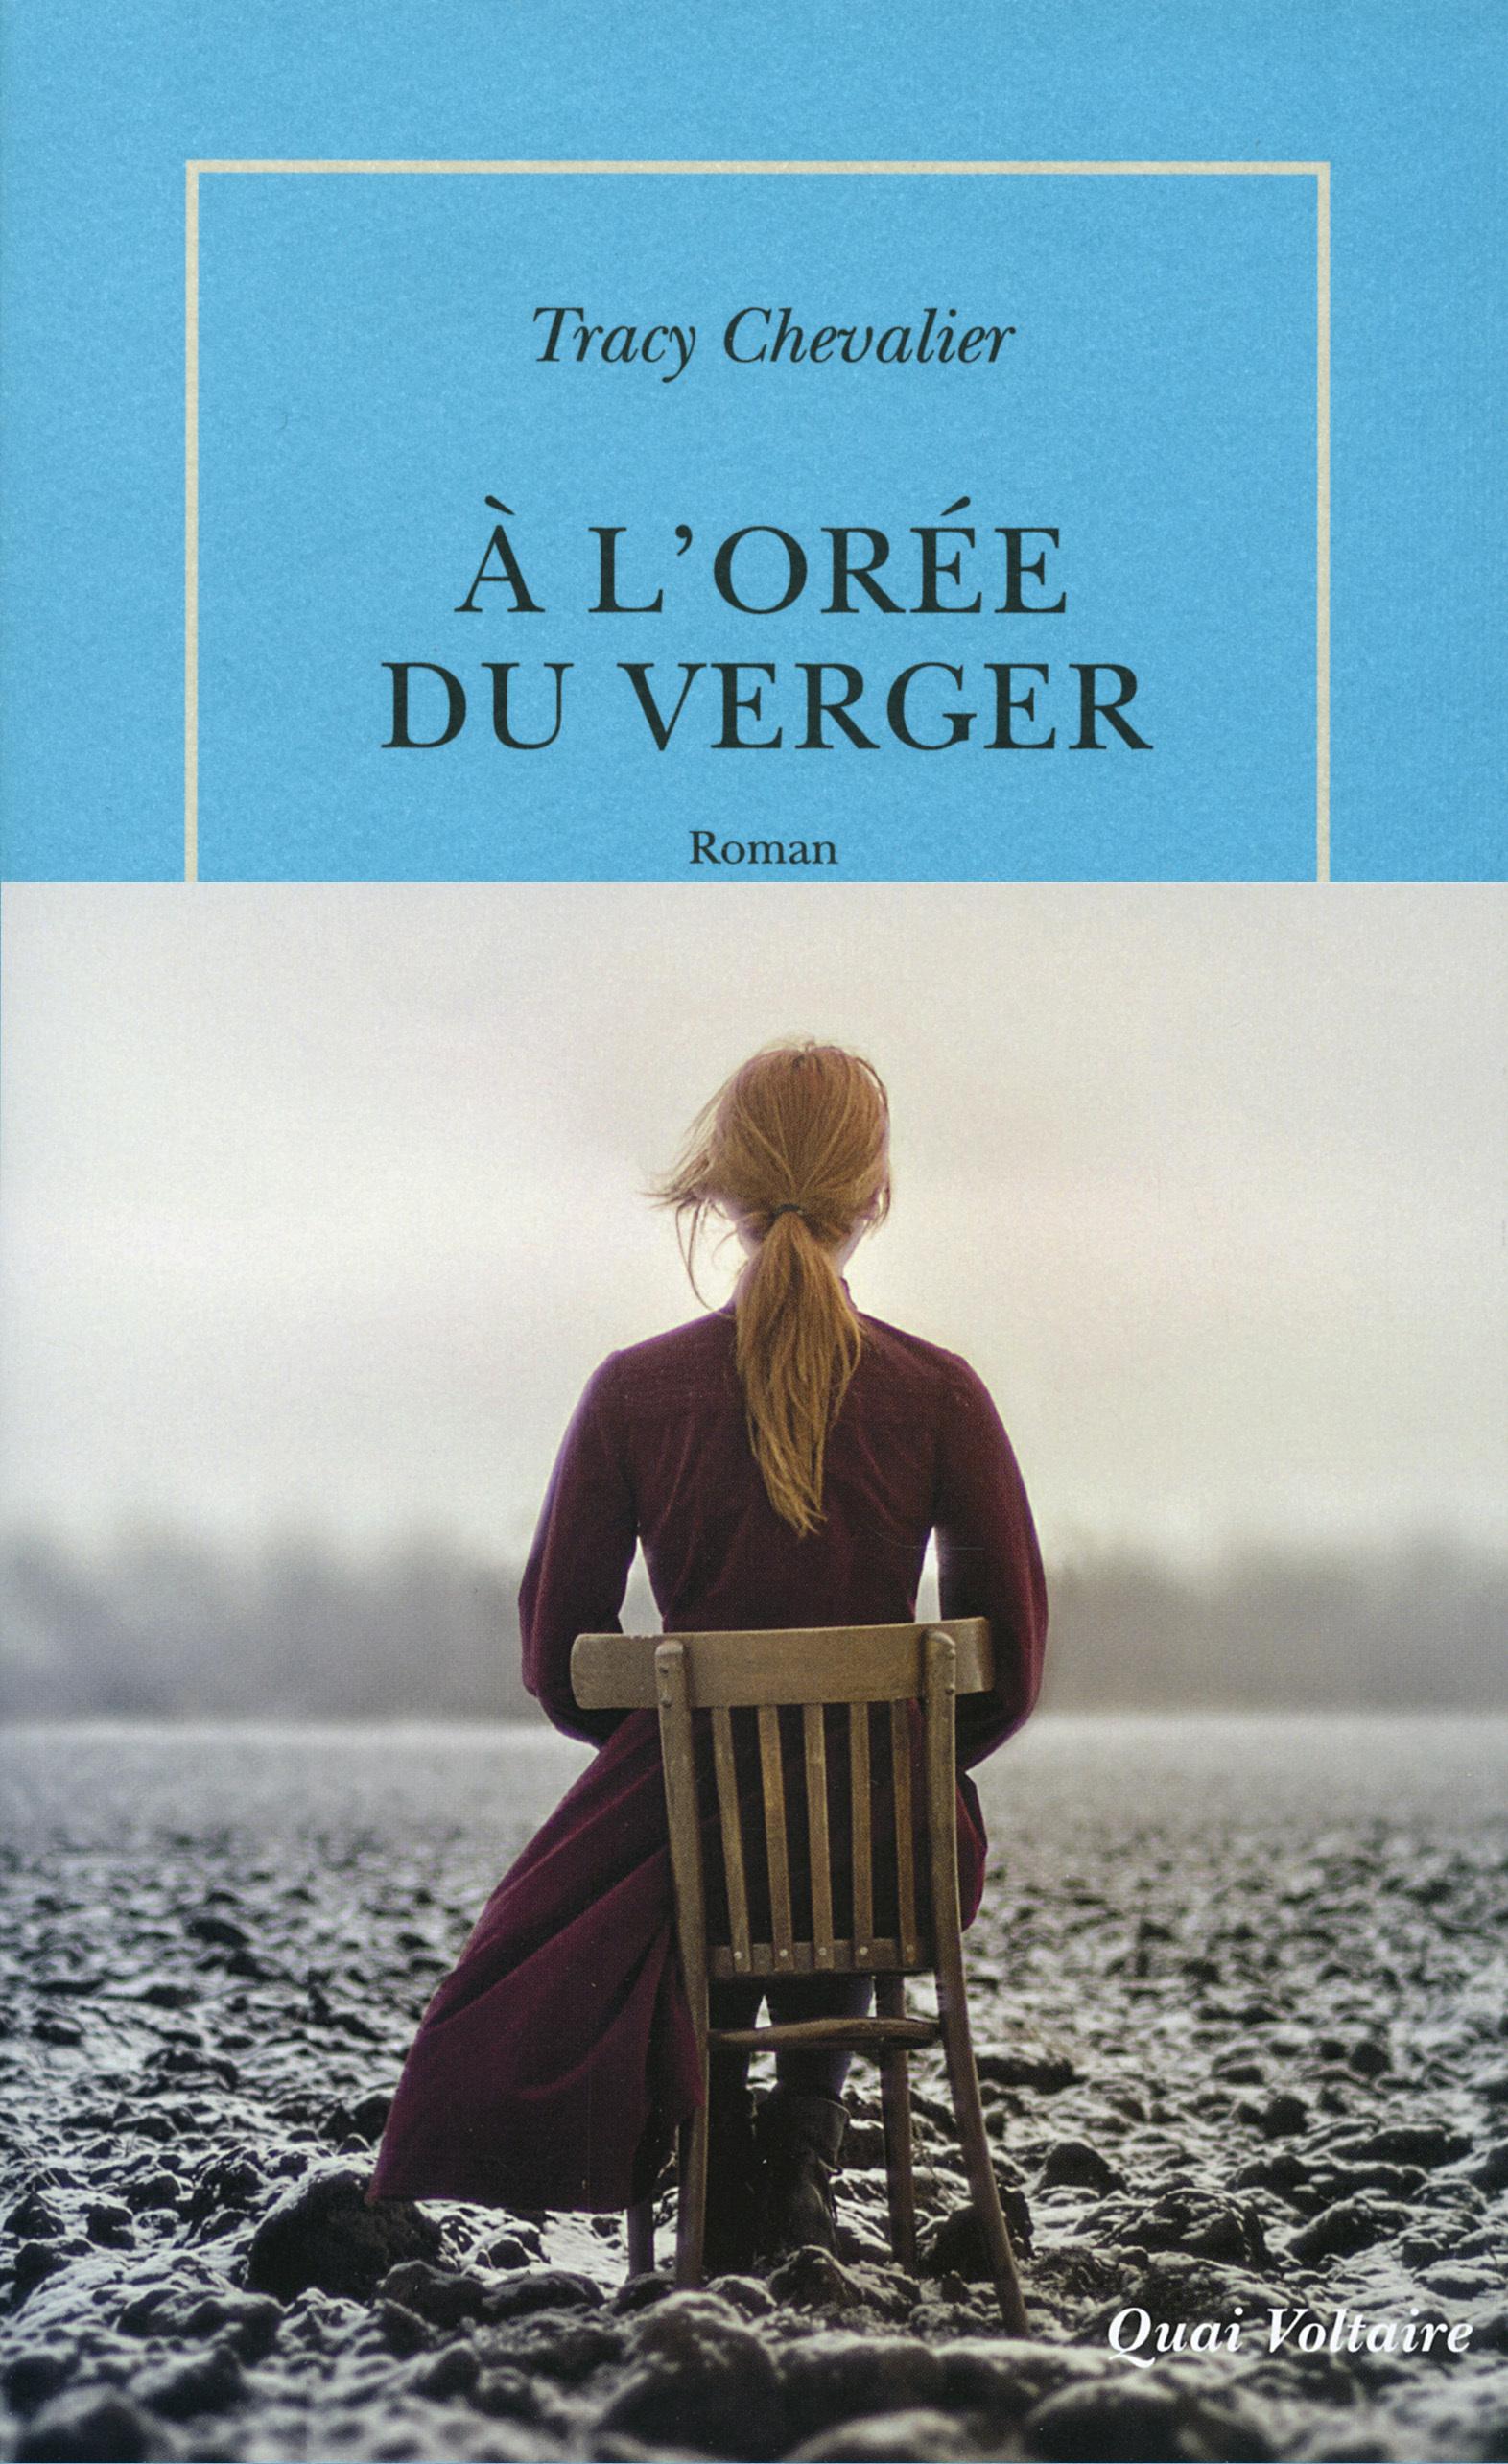 A L'OREE DU VERGER